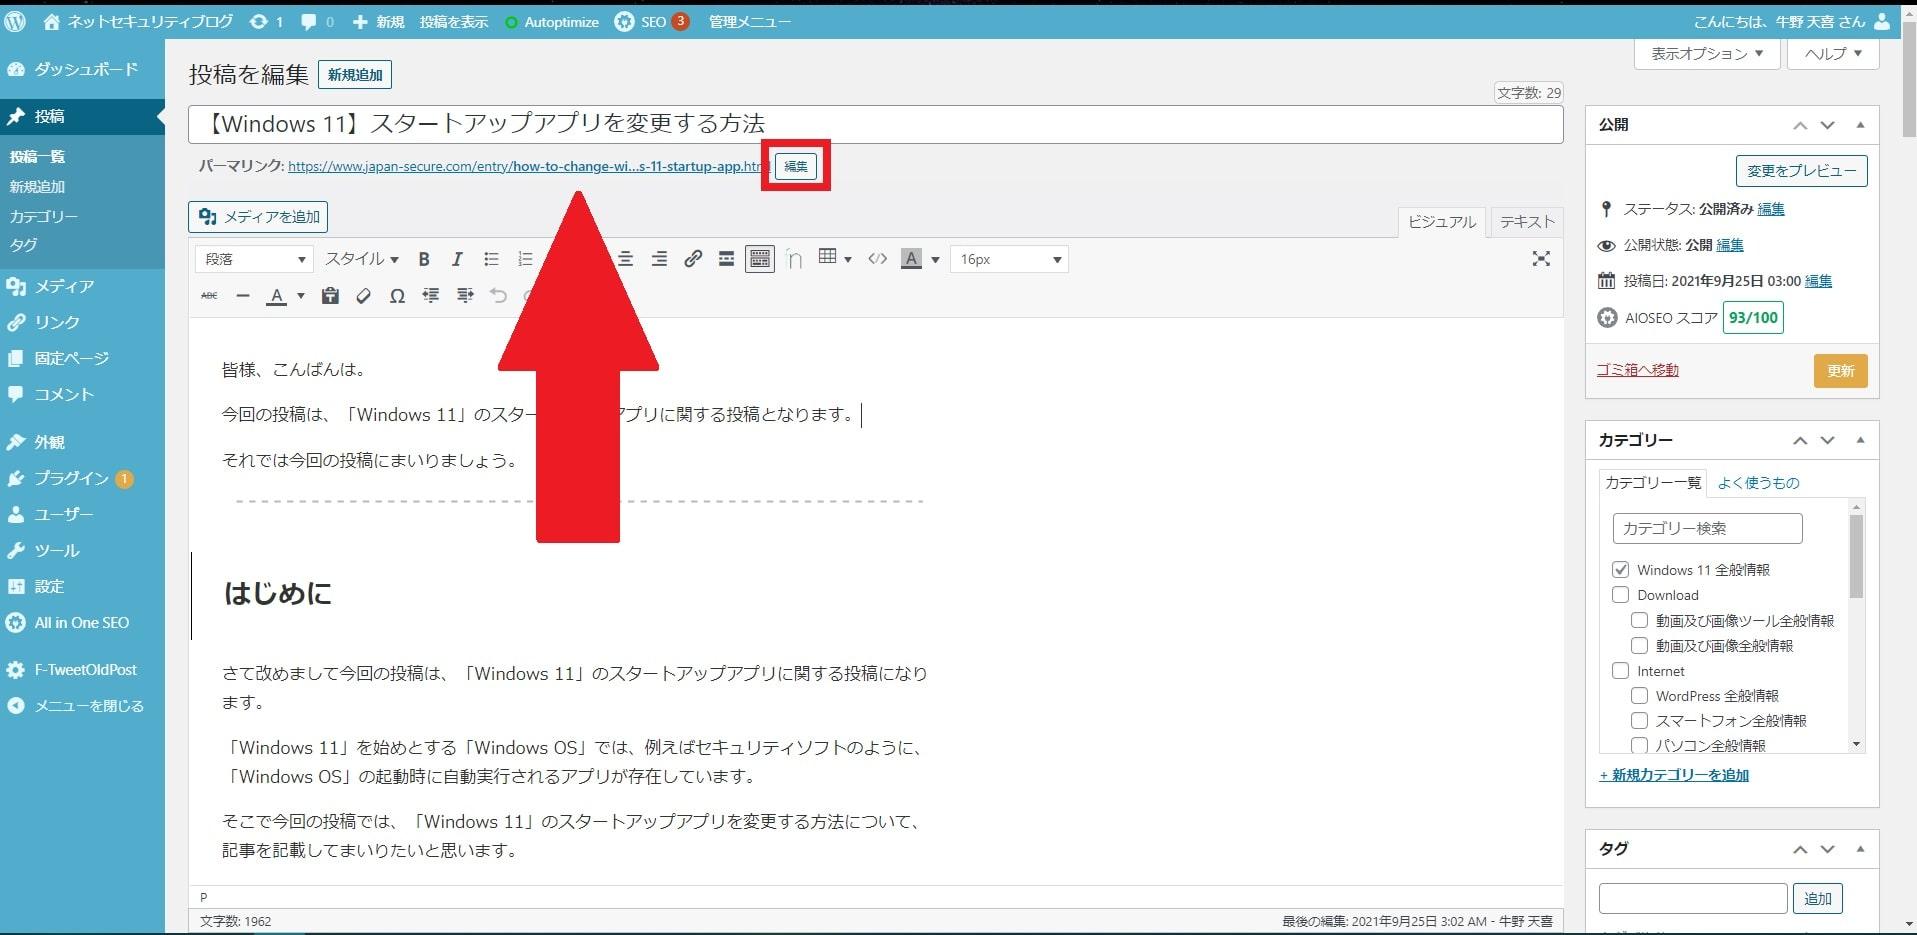 WordPressの記事編集画面のURL変更の項目